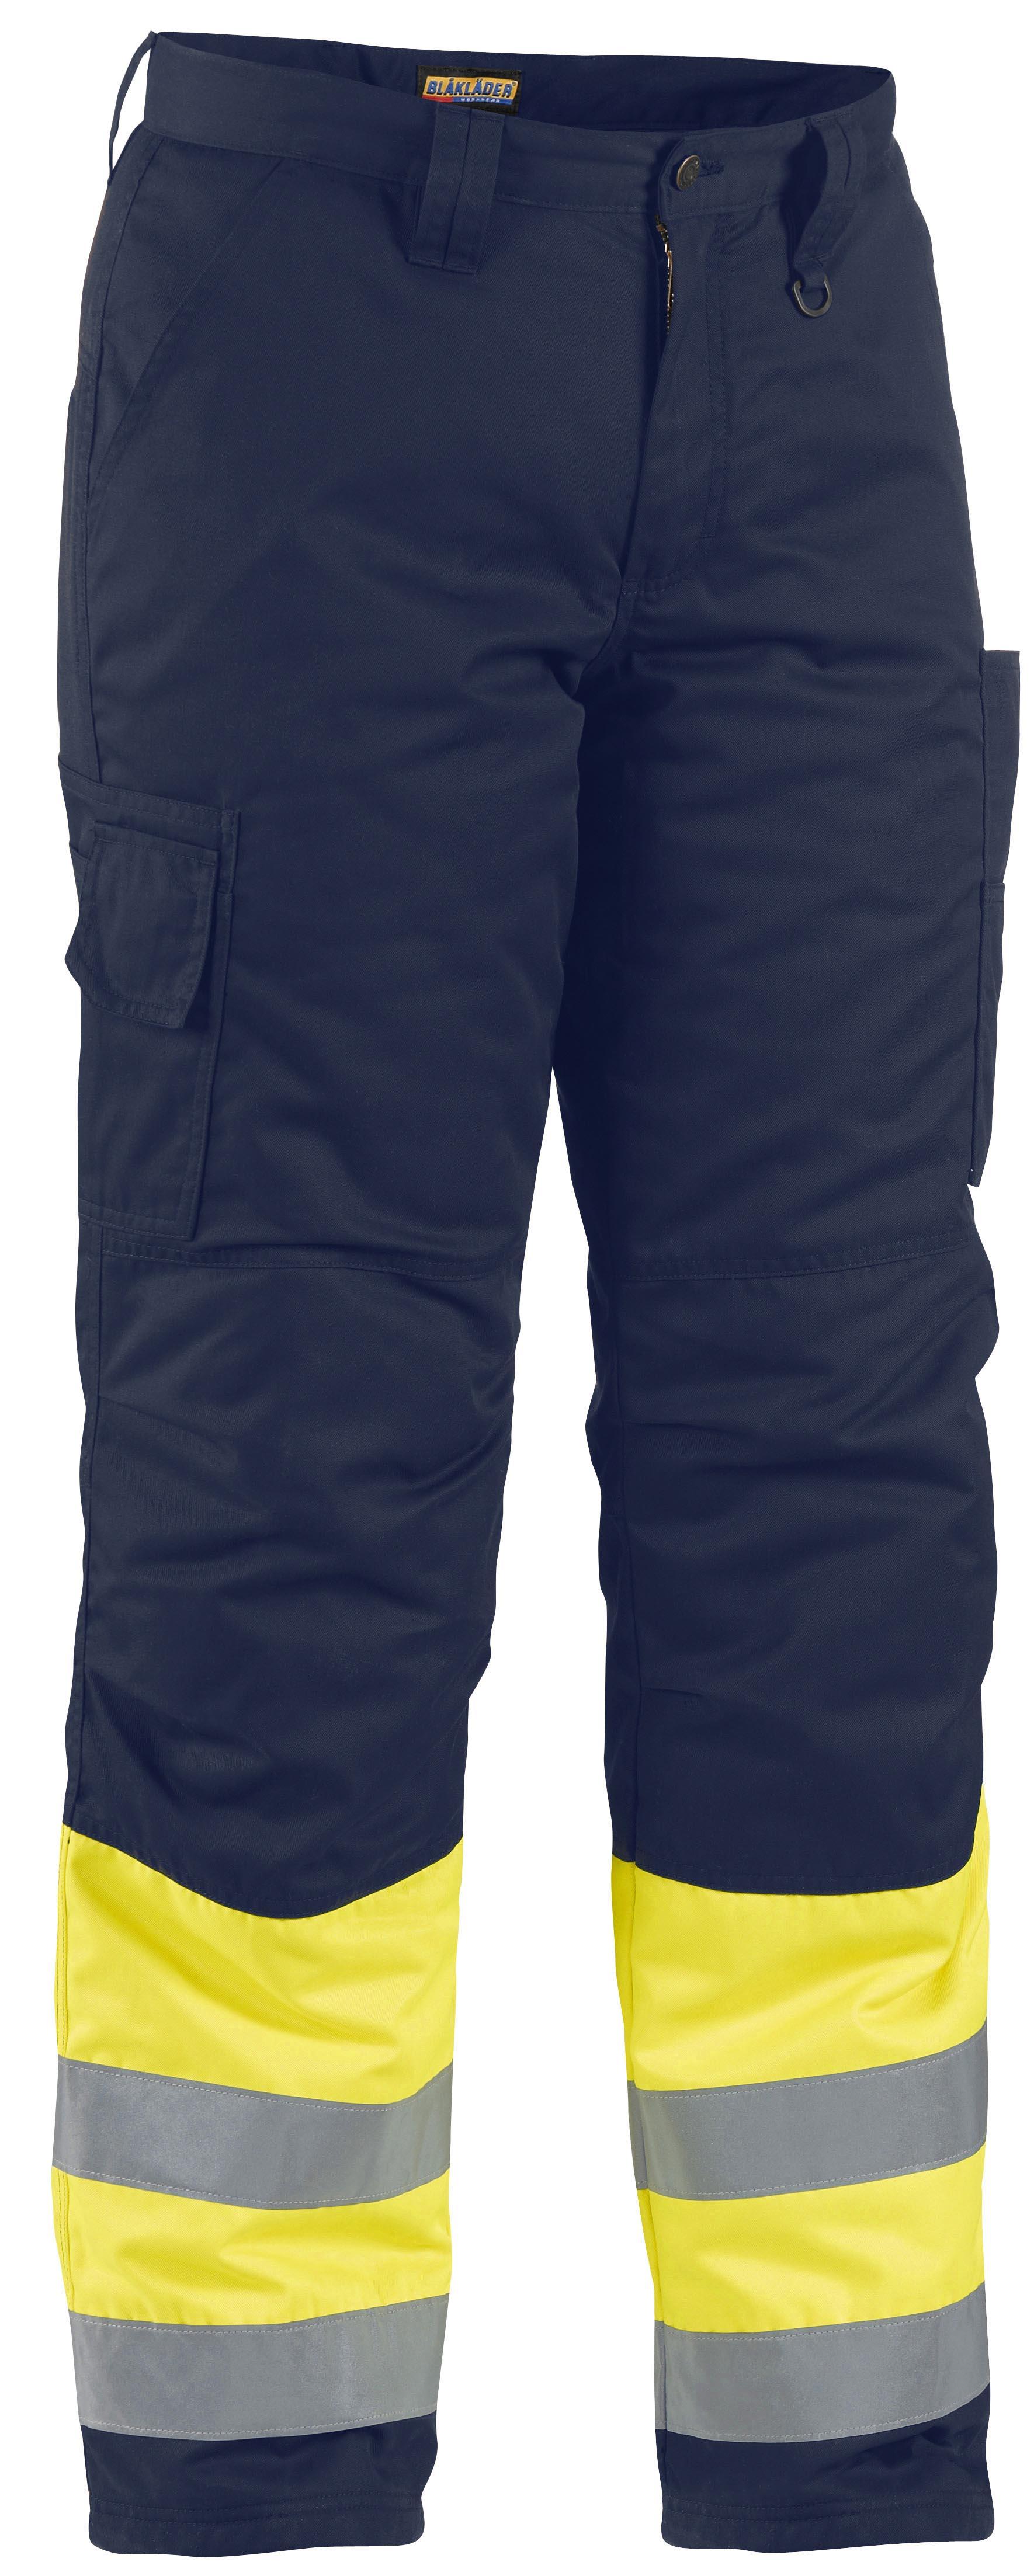 pantalon haute visibilit hiver pantalon de travail v tements de travail haute visibilit. Black Bedroom Furniture Sets. Home Design Ideas